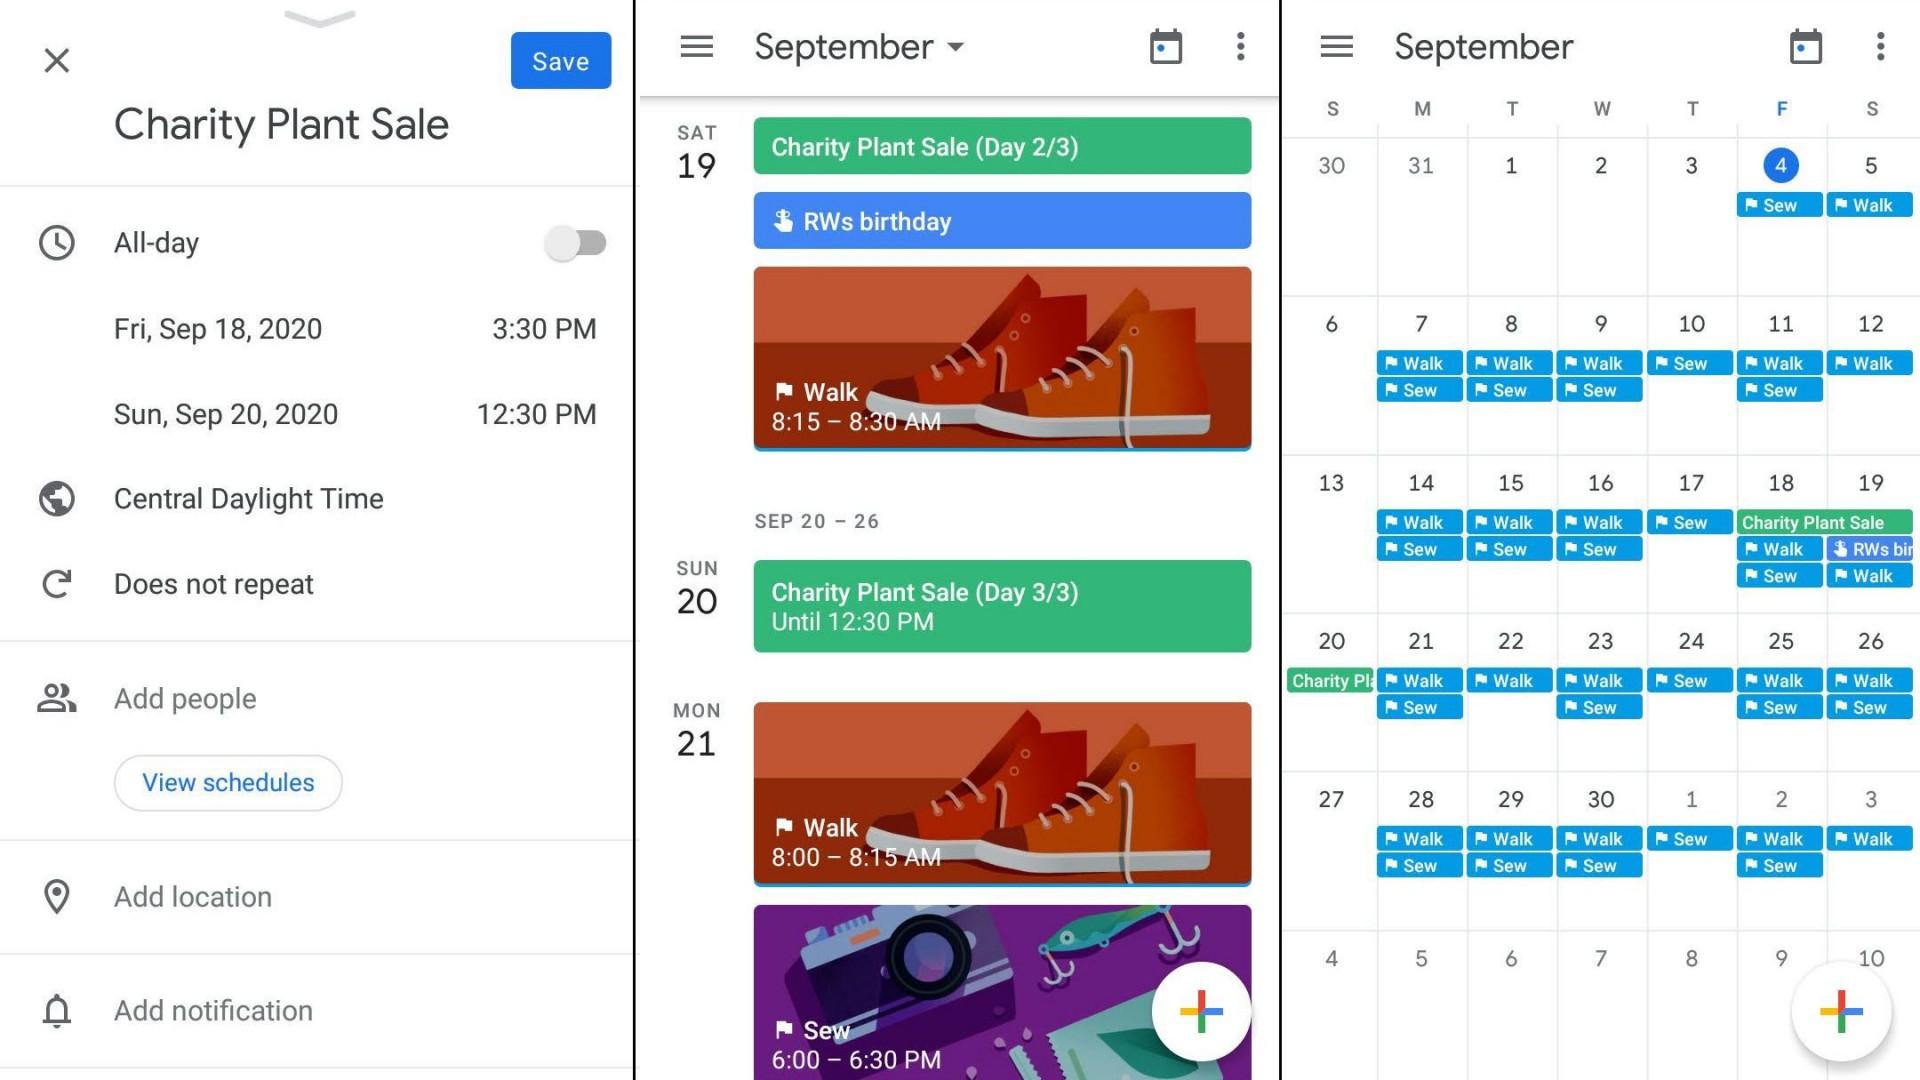 002 Shocking Editable Calendar Google Doc 2021 High Resolution 1920